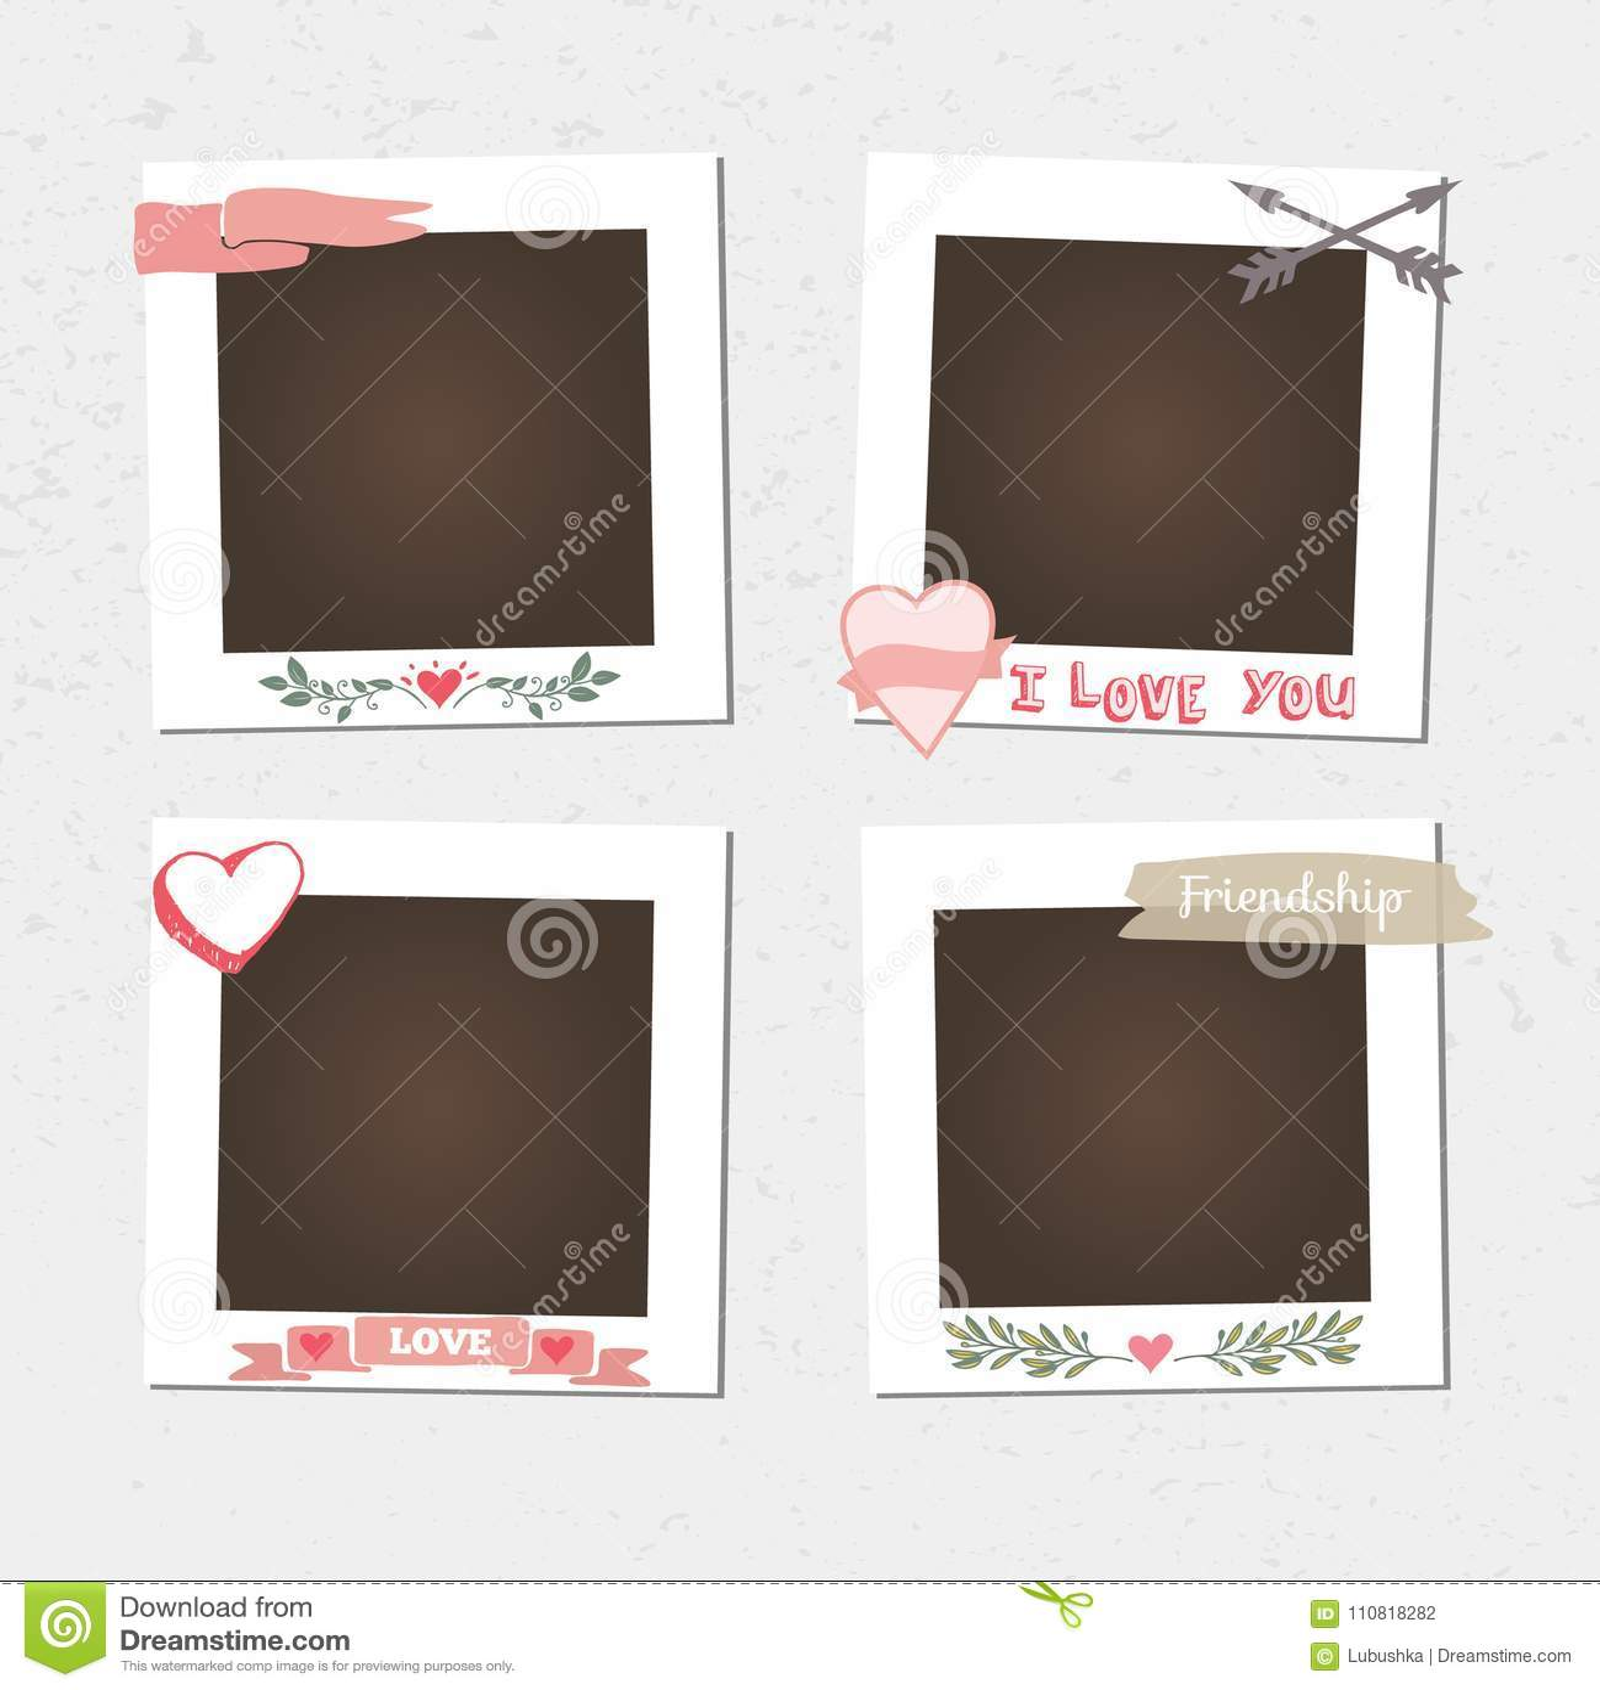 Wedding vector frame stock vector. Illustration of image - 110818282